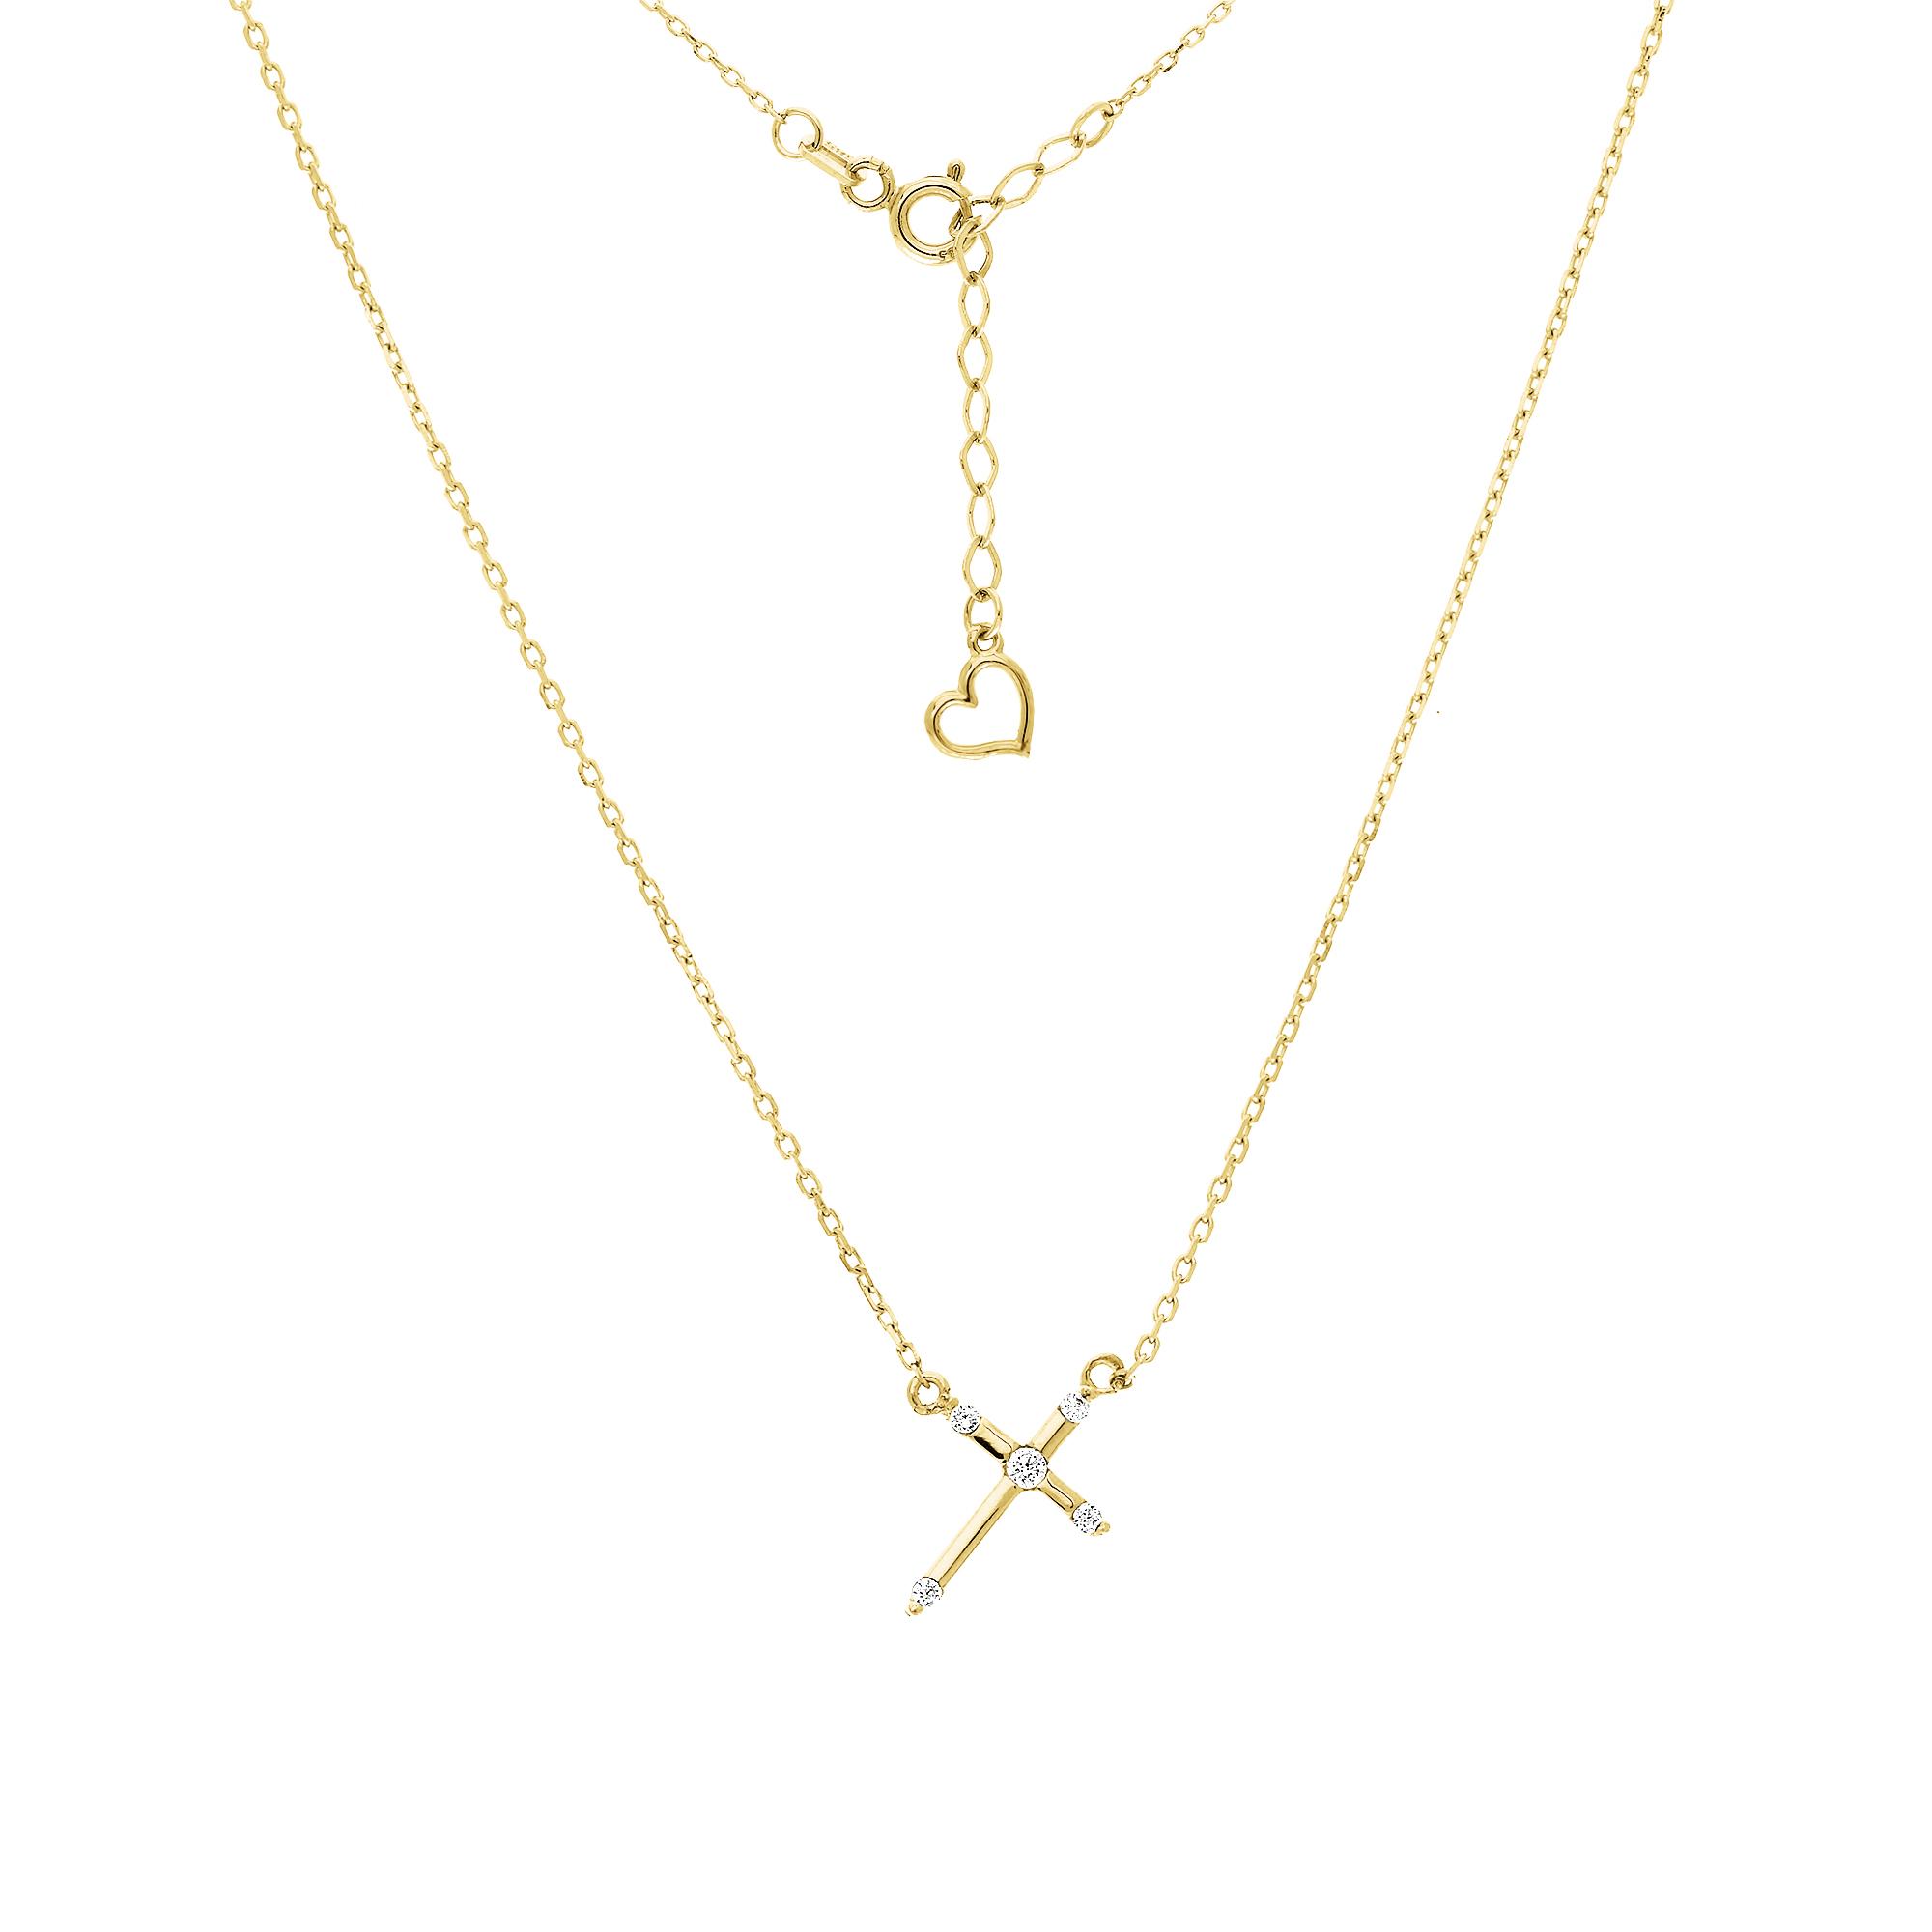 Harf M-118N-GZ-C-KRZ - biżuteria